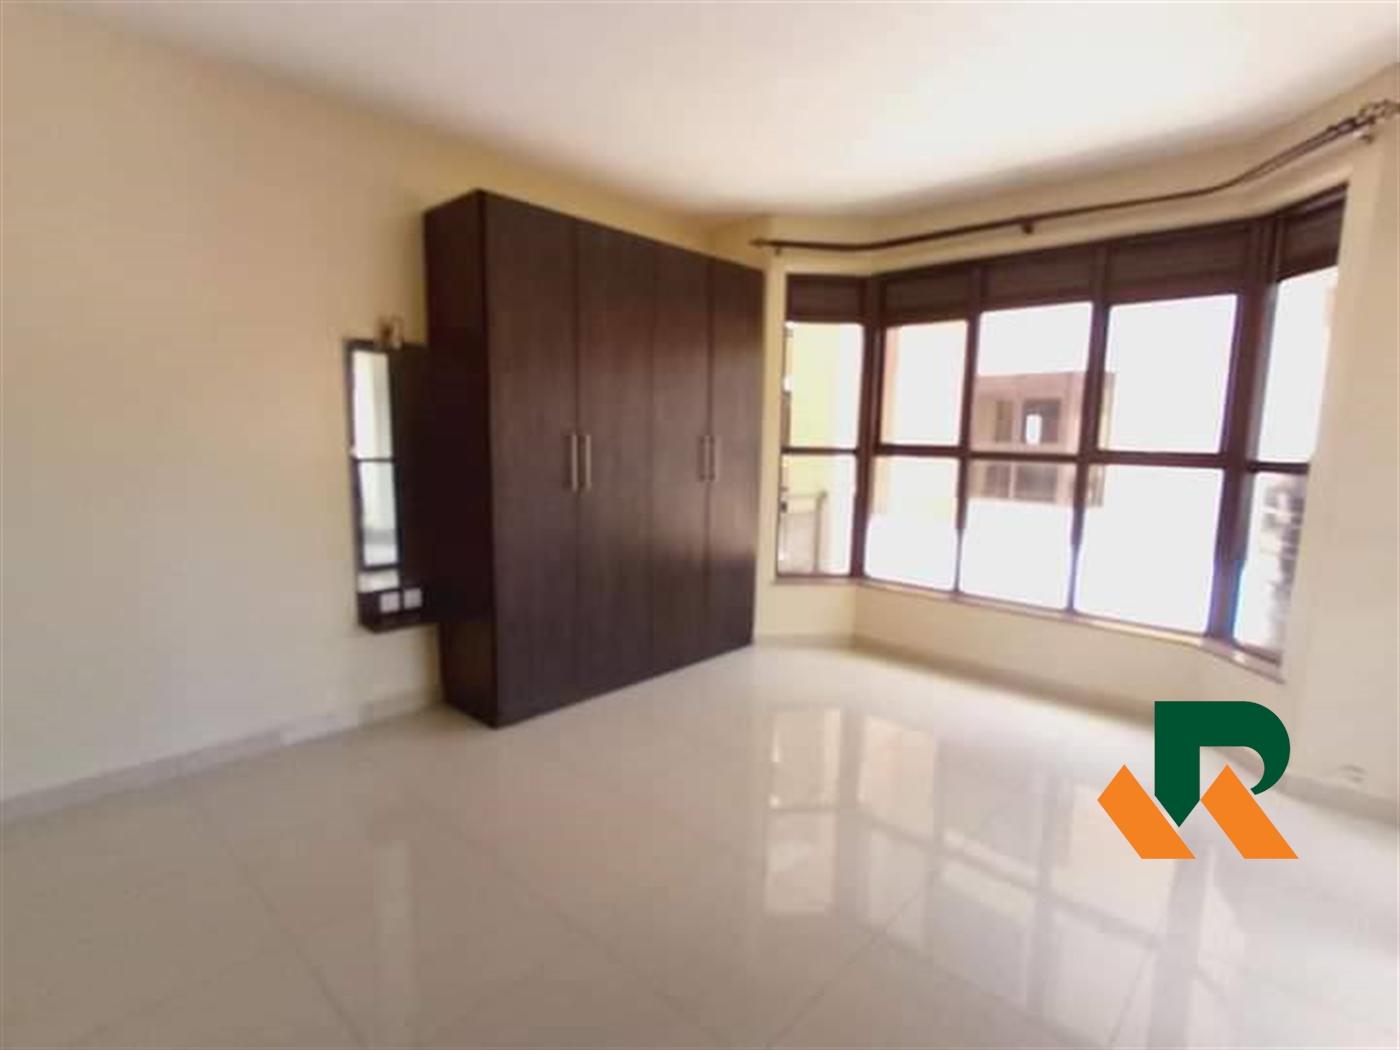 Apartment for sale in Ntinda Kampala